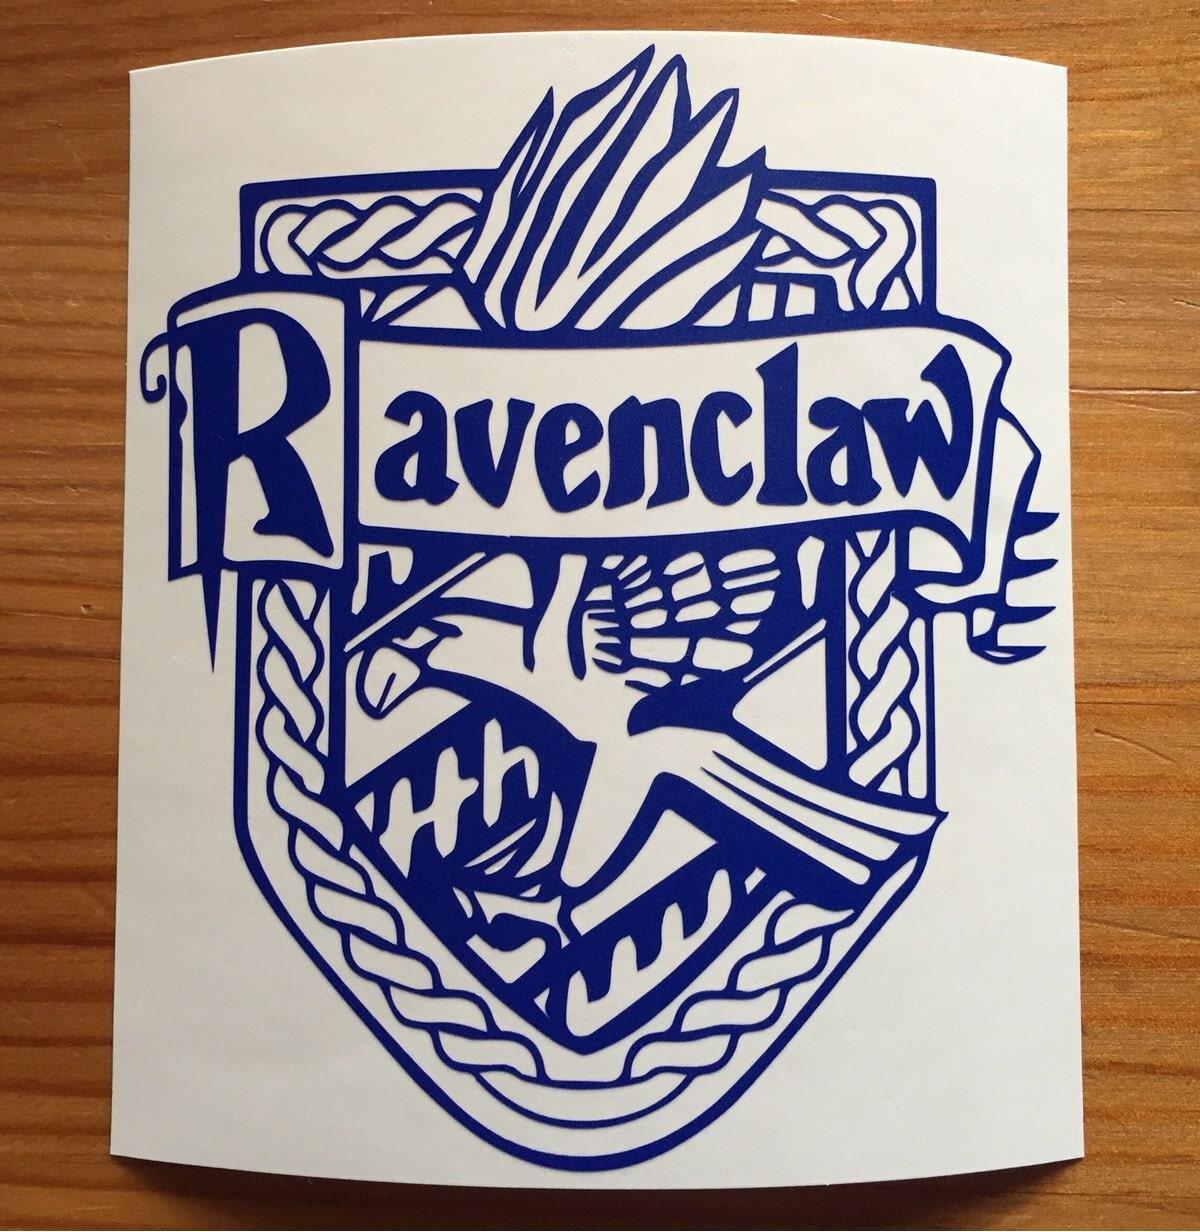 Harry Potter Inspired Decal Sticker Ravenclaw Crest Sticker Hogwarts Laptop Sticker MacBook Sticker HP Tablet Sticker Gift For HP Fan